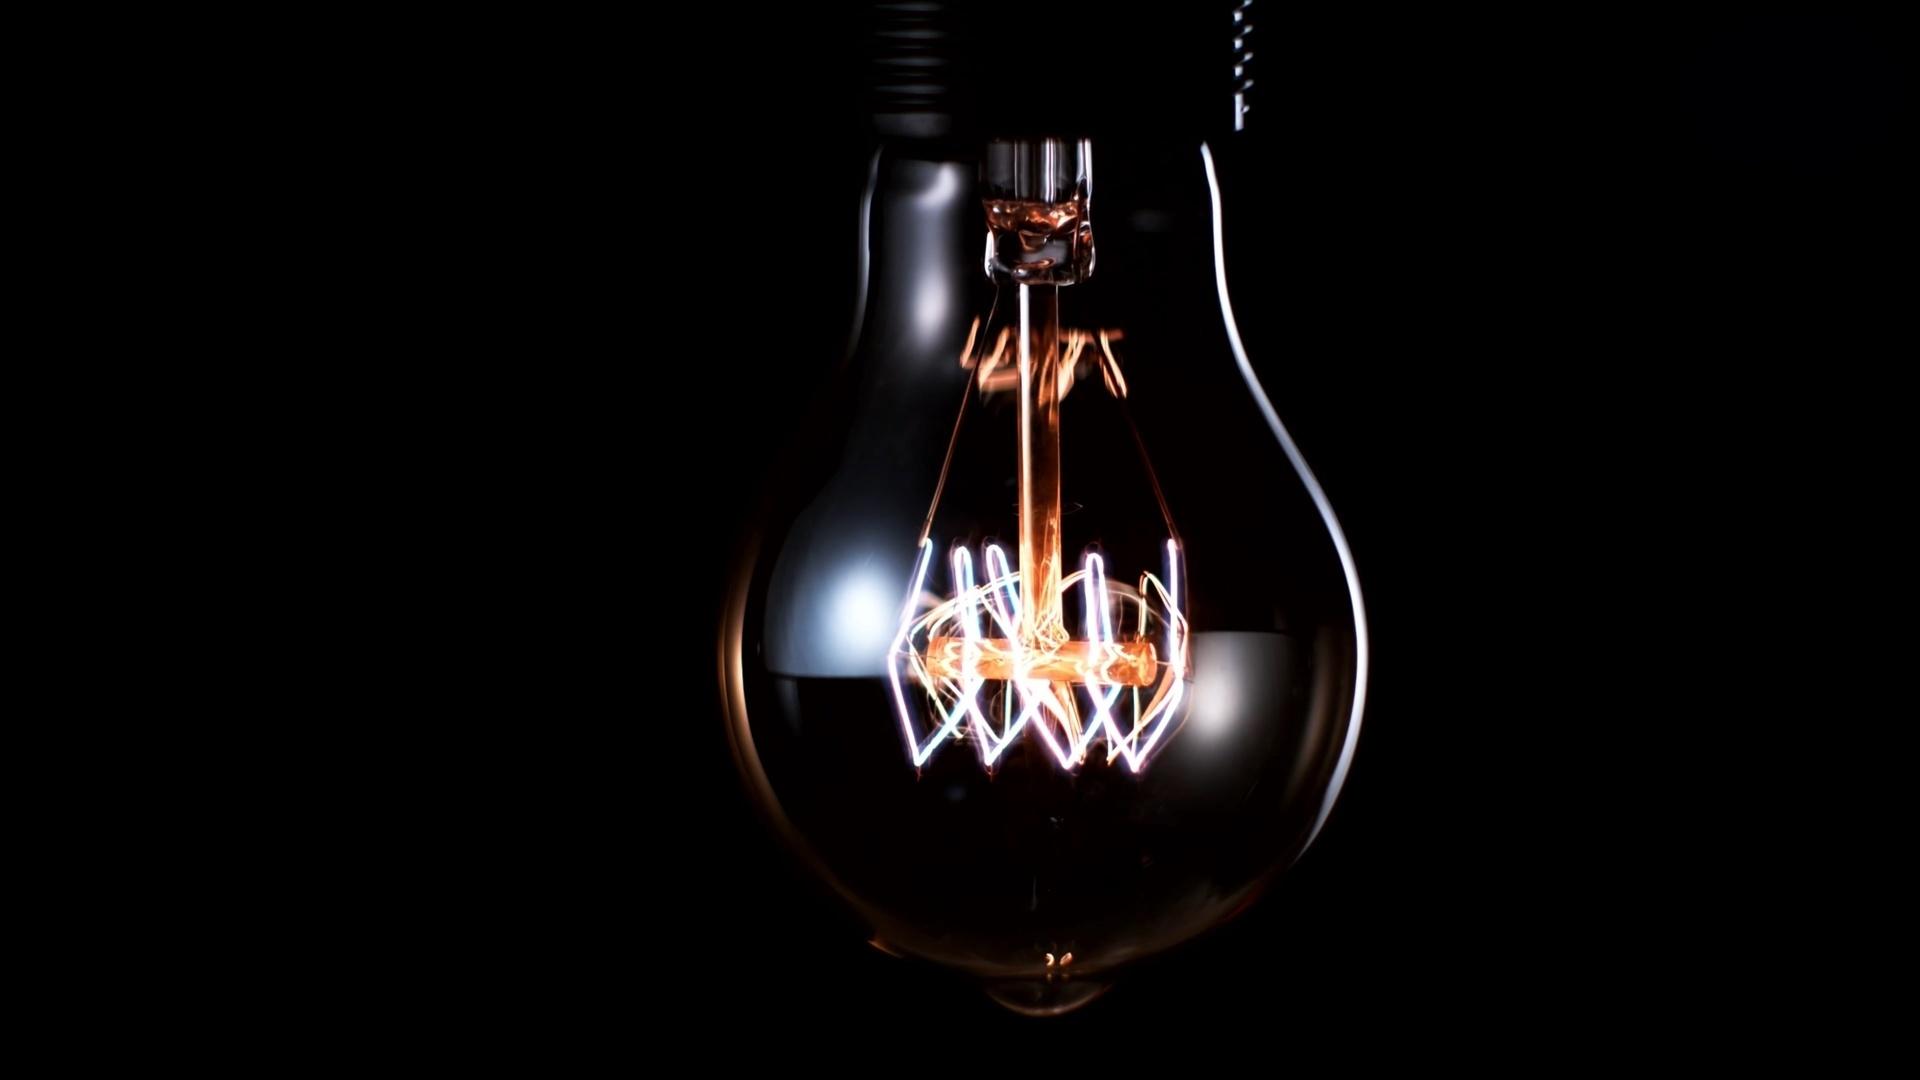 Light Bulb HD Wallpaper